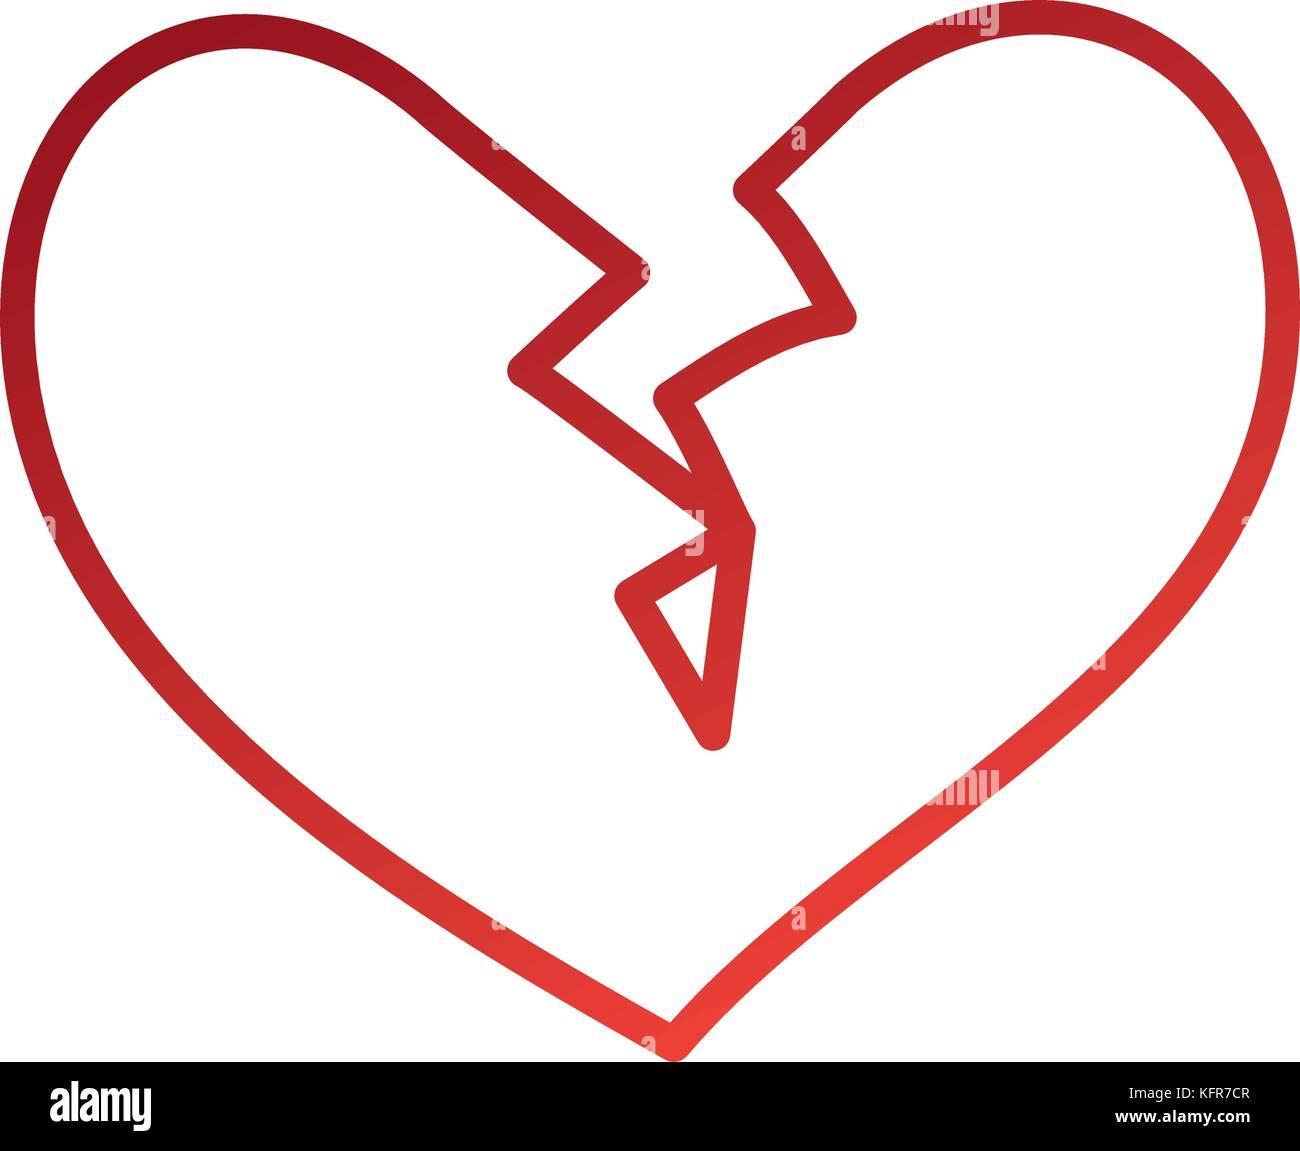 Broken heart character symbol images symbol and sign ideas broken heart stock vector images alamy broken heart icon divorce end of love symbol stock vector buycottarizona Choice Image